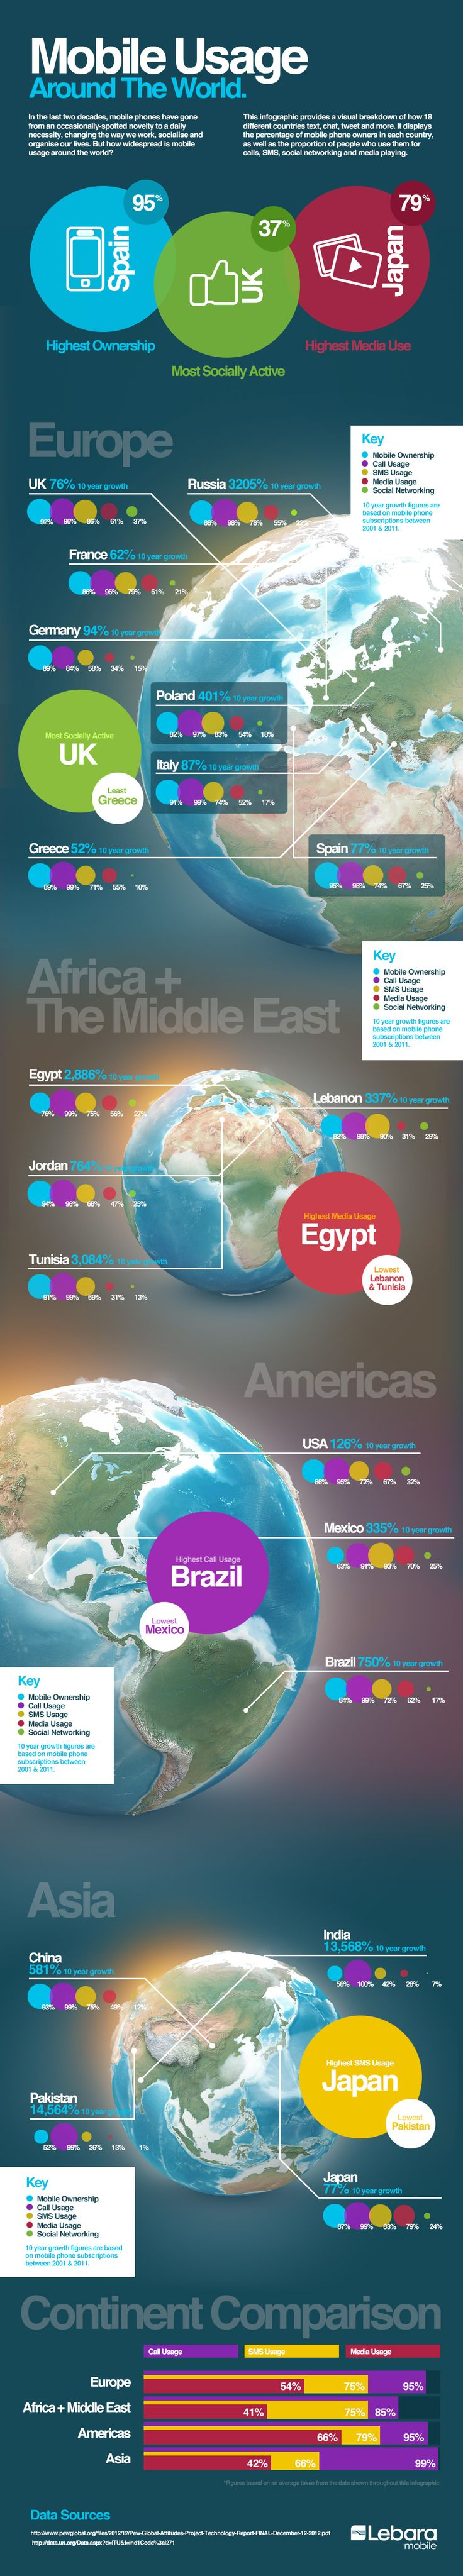 Mobile usage around the World #infographic